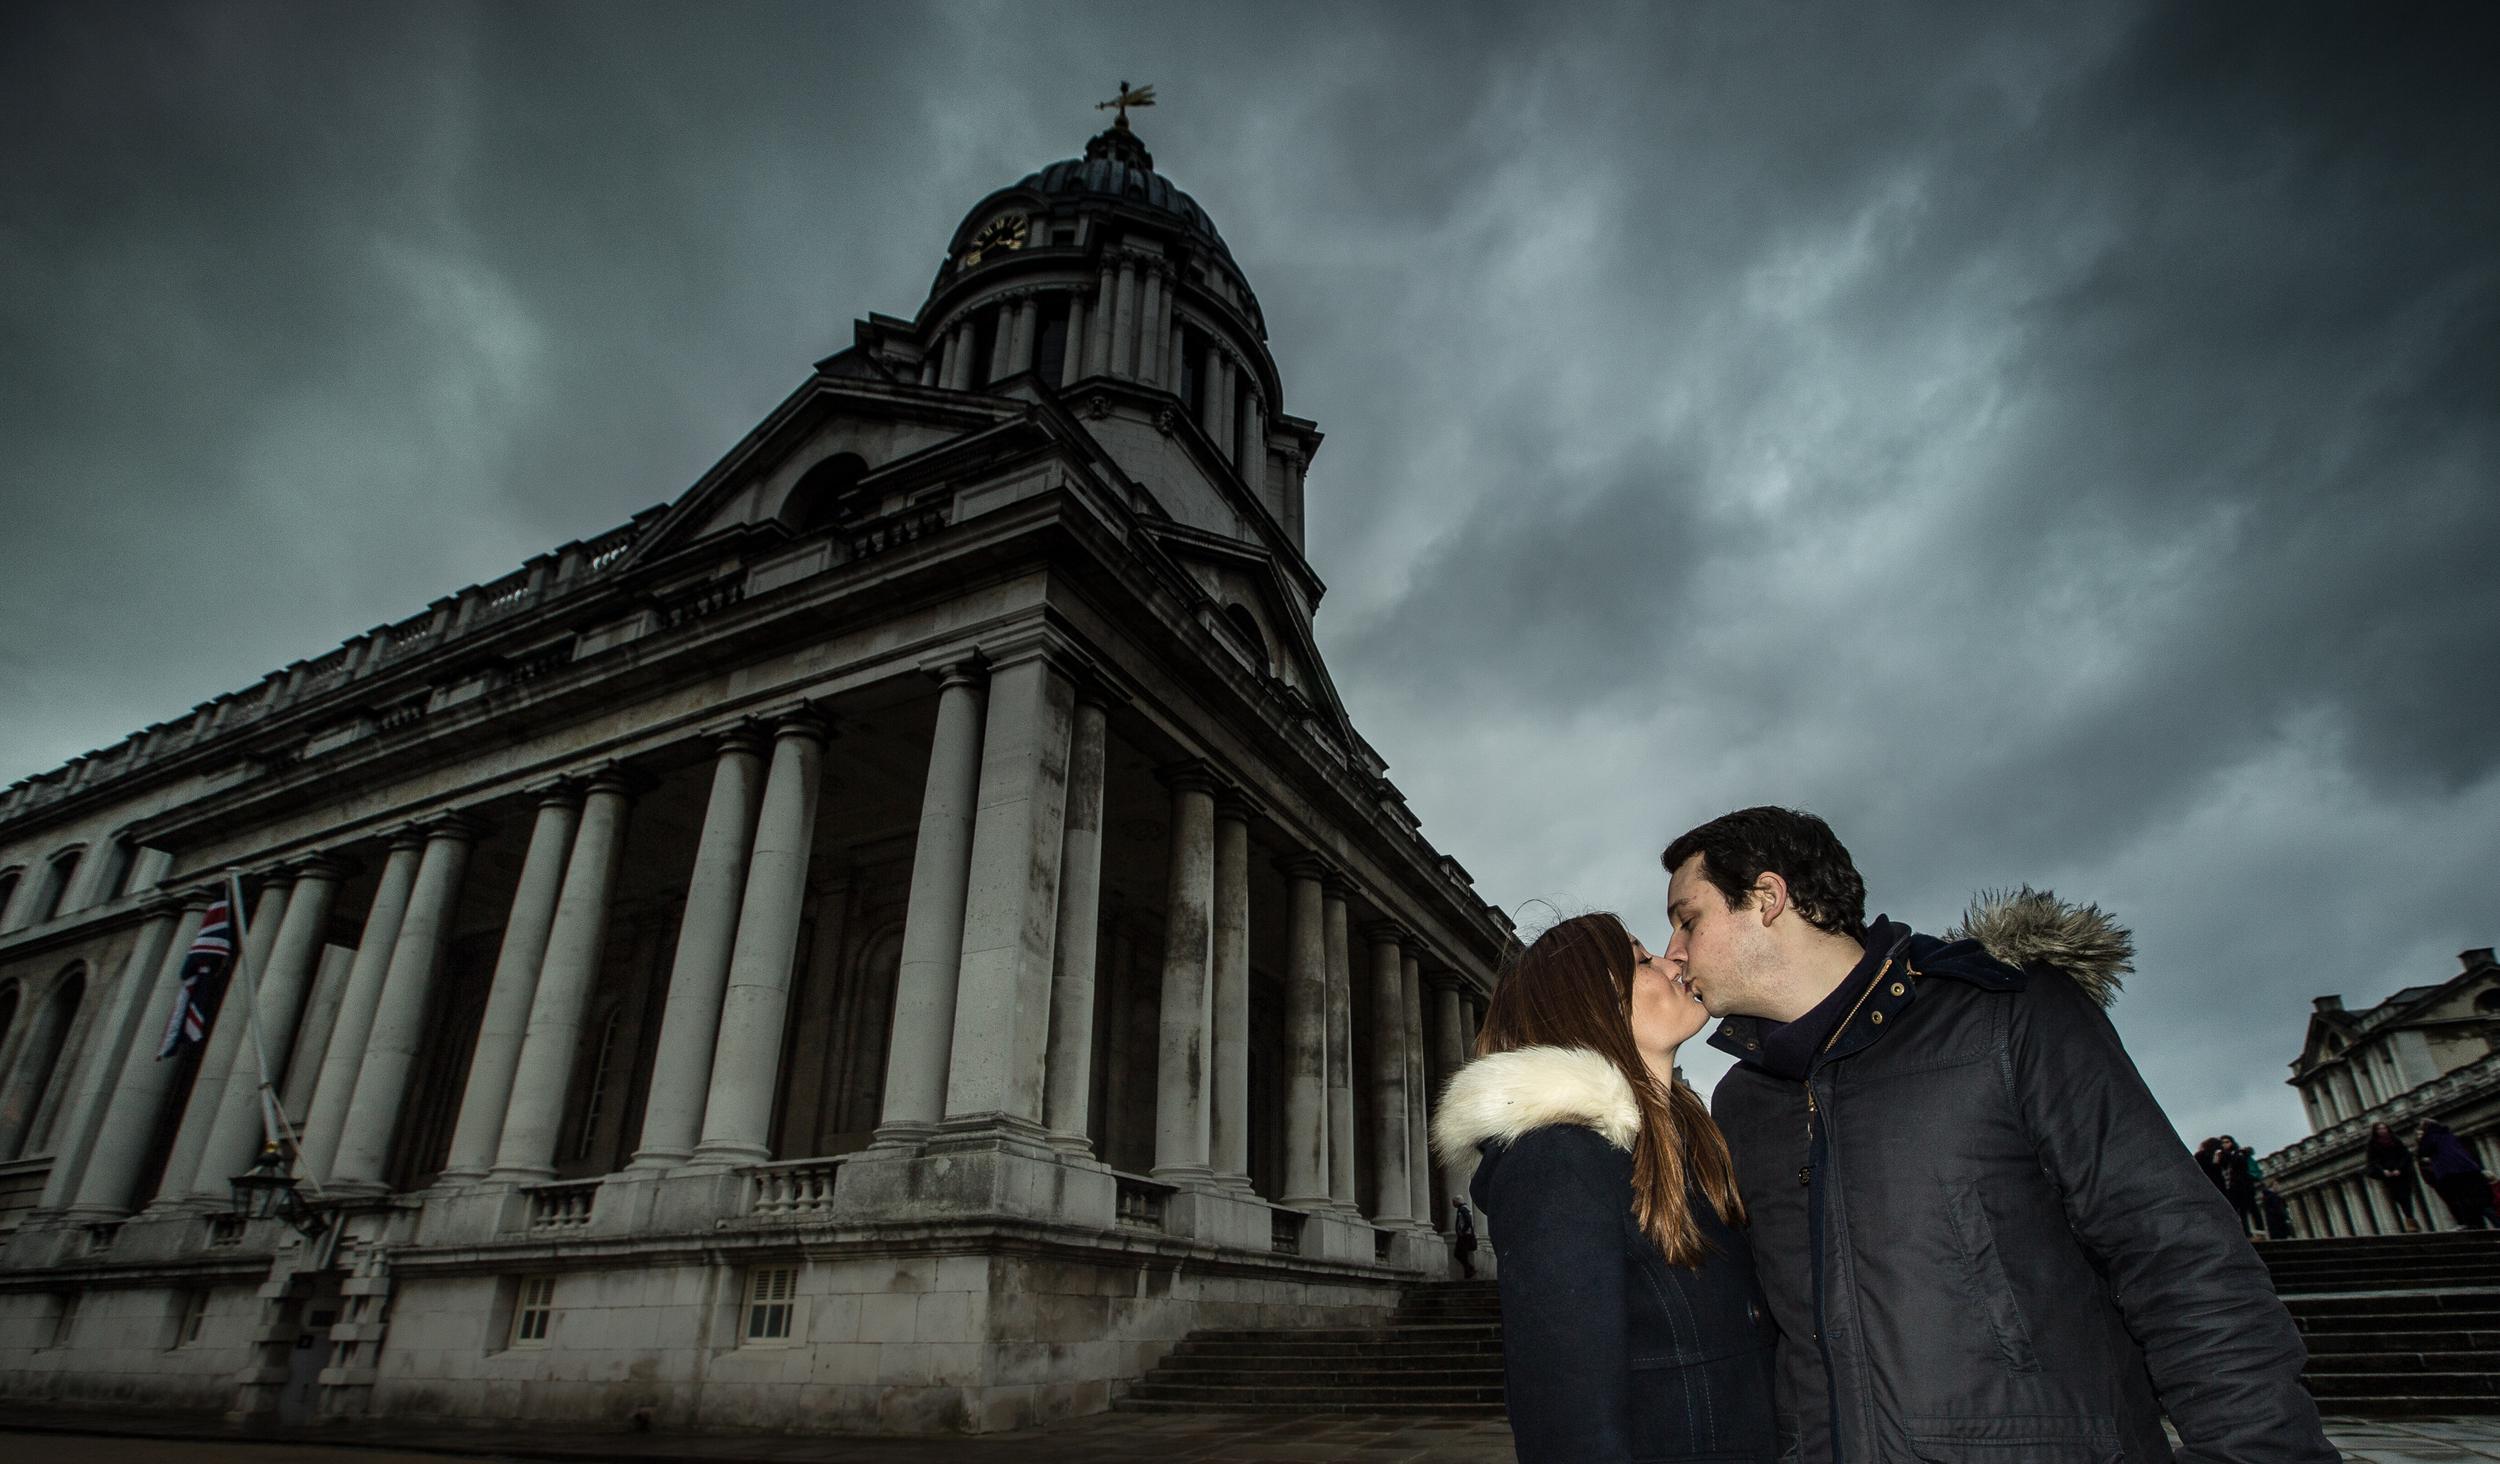 greenwich-royal-naval-academy-4-london-uk-destination-wedding-photography-Adam-Rowley